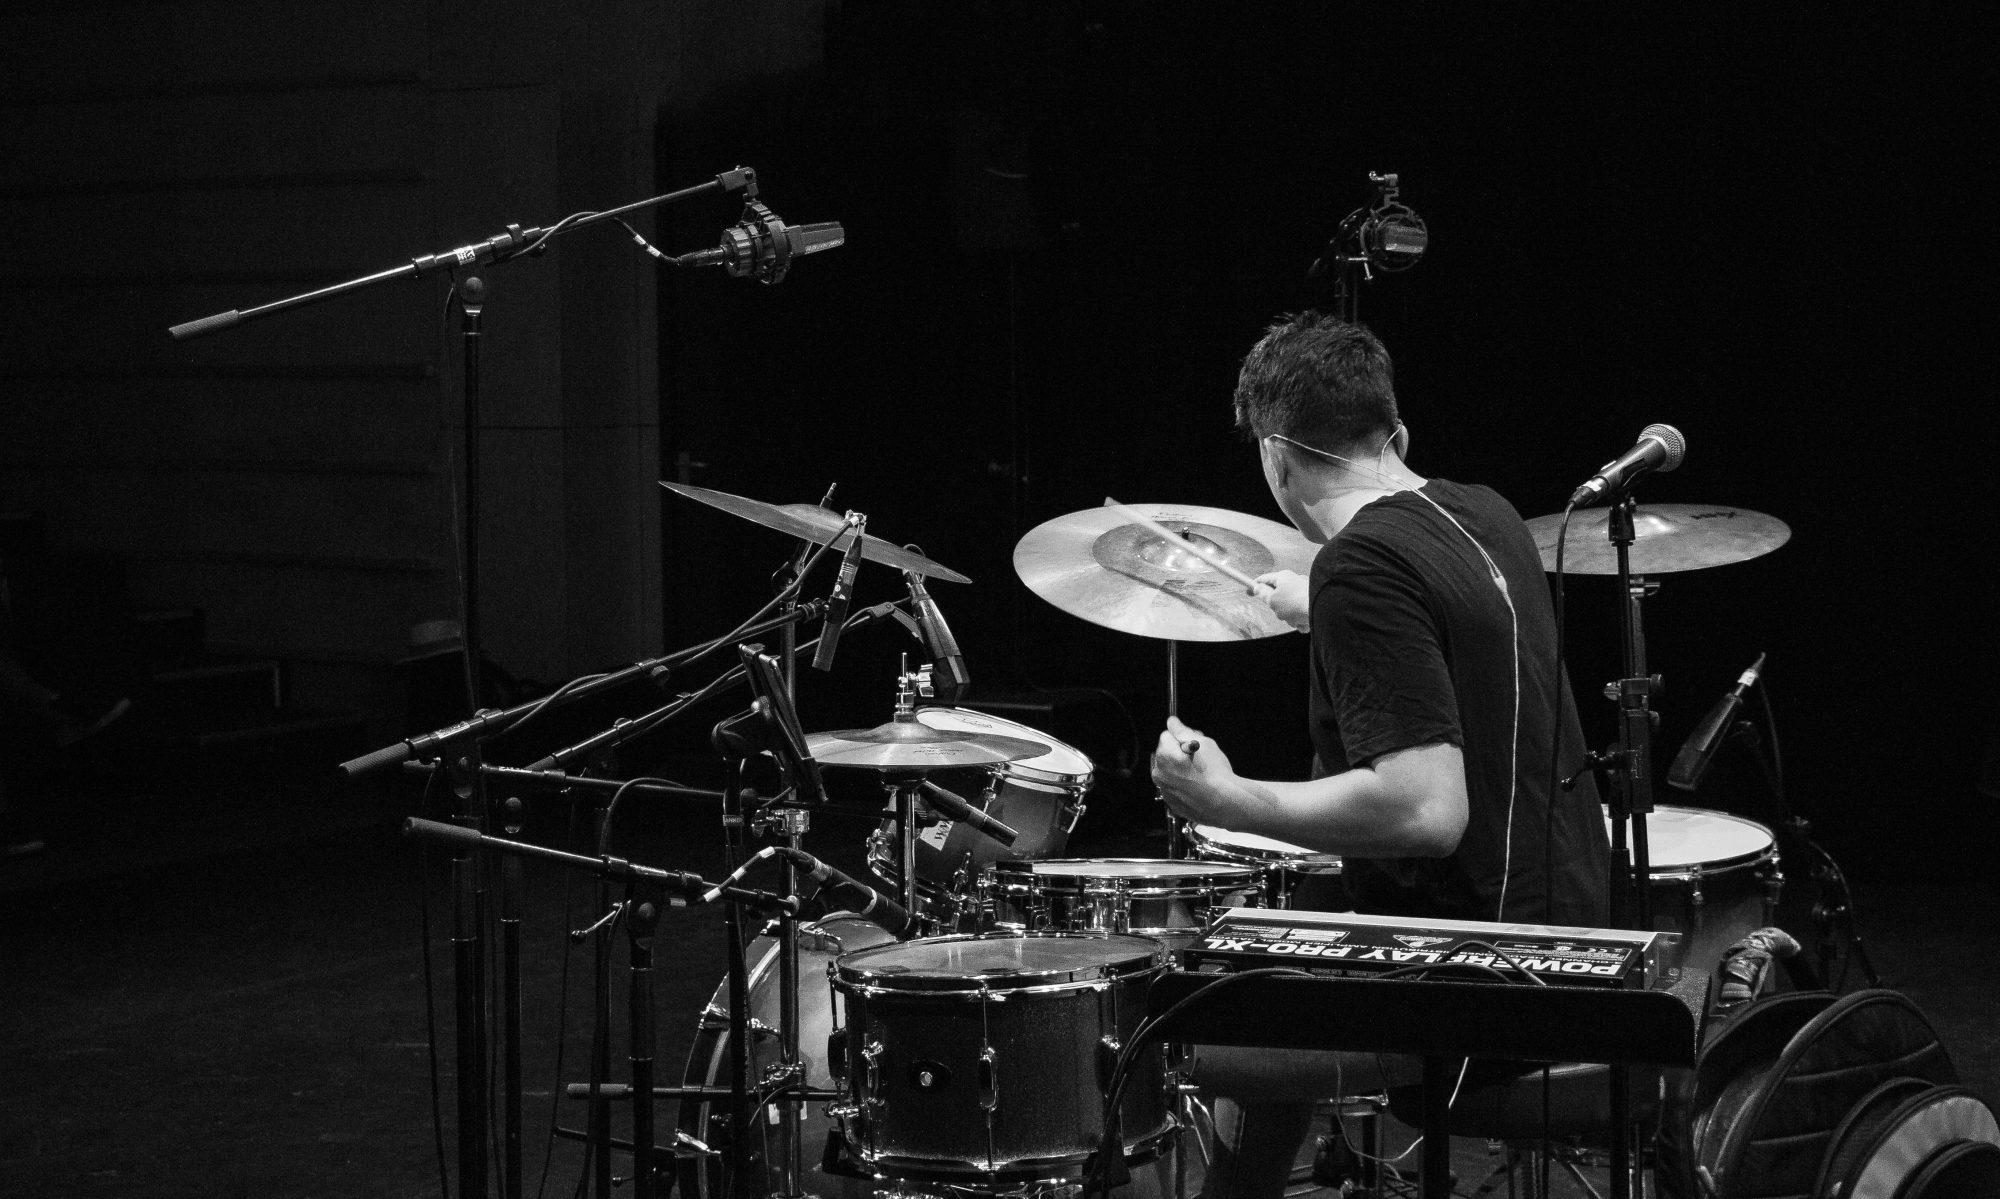 Nello Biasini Music | Drummer, Educator & Music Producer